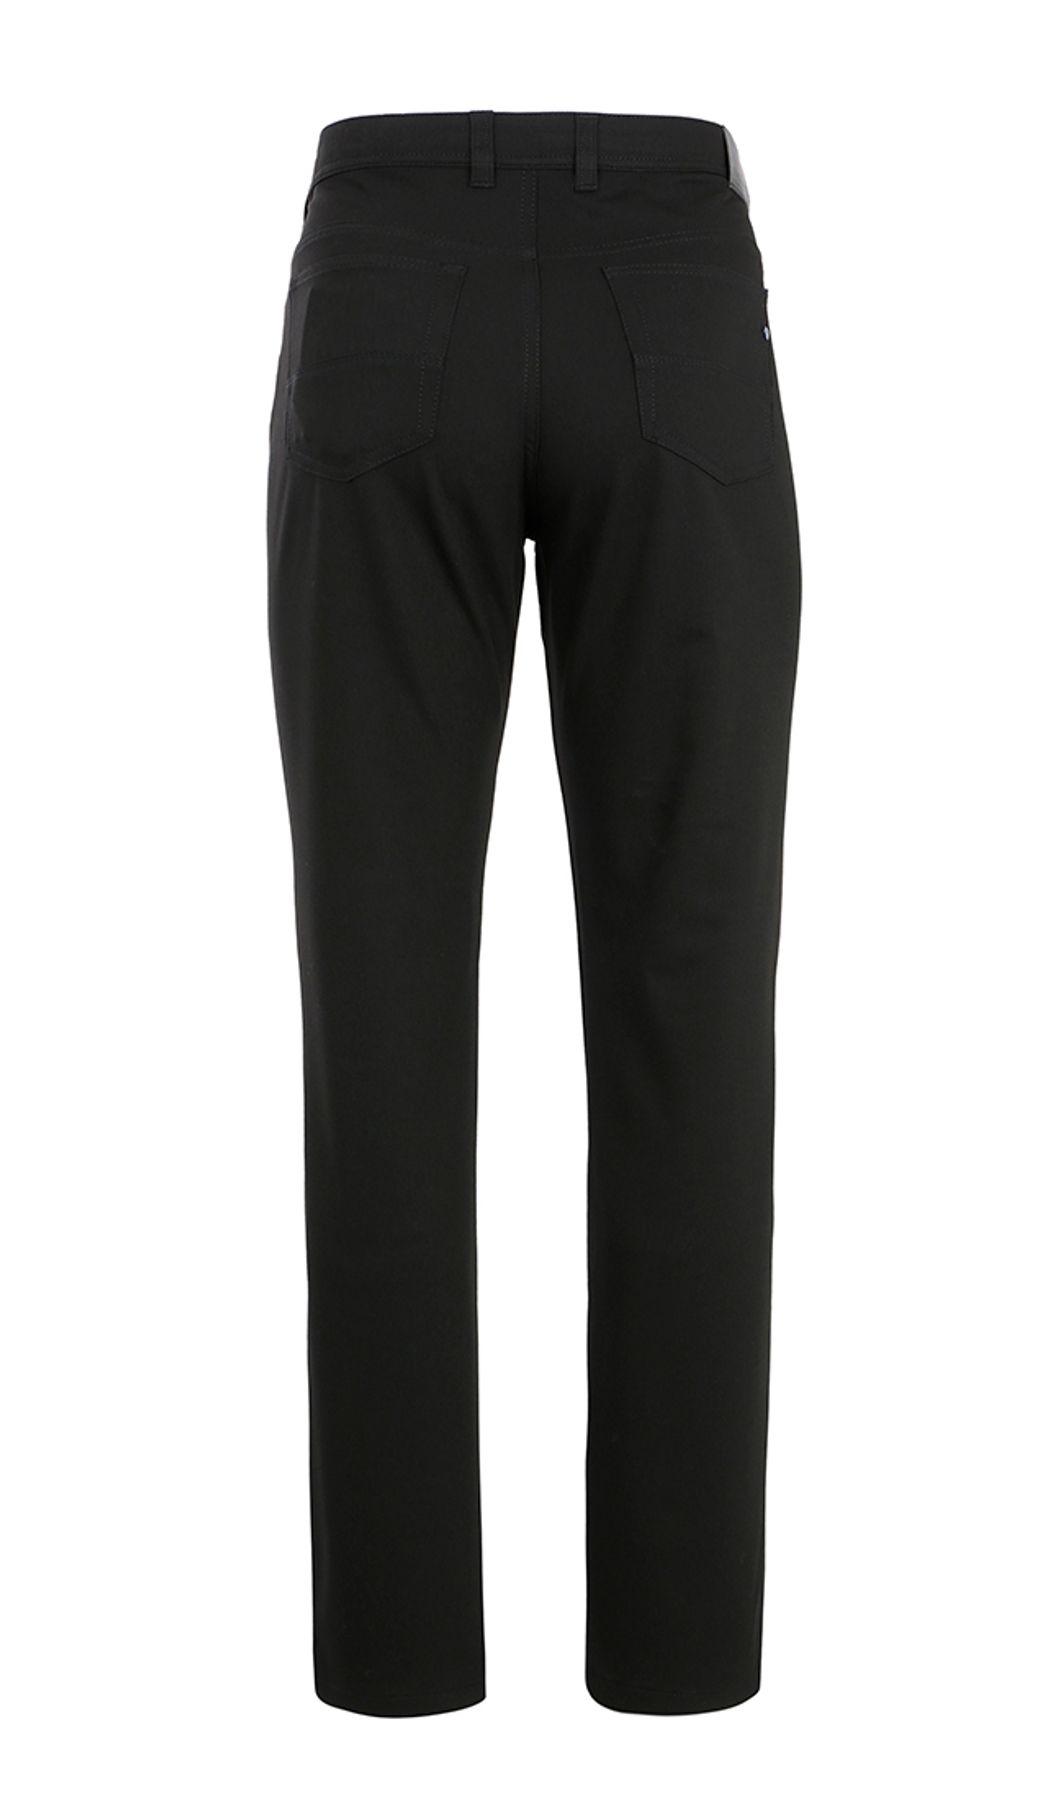 Brühl - Herren 5-Pocket Hose in Wolloptik in schwarz, Genua 1 (0289110200100) – Bild 2